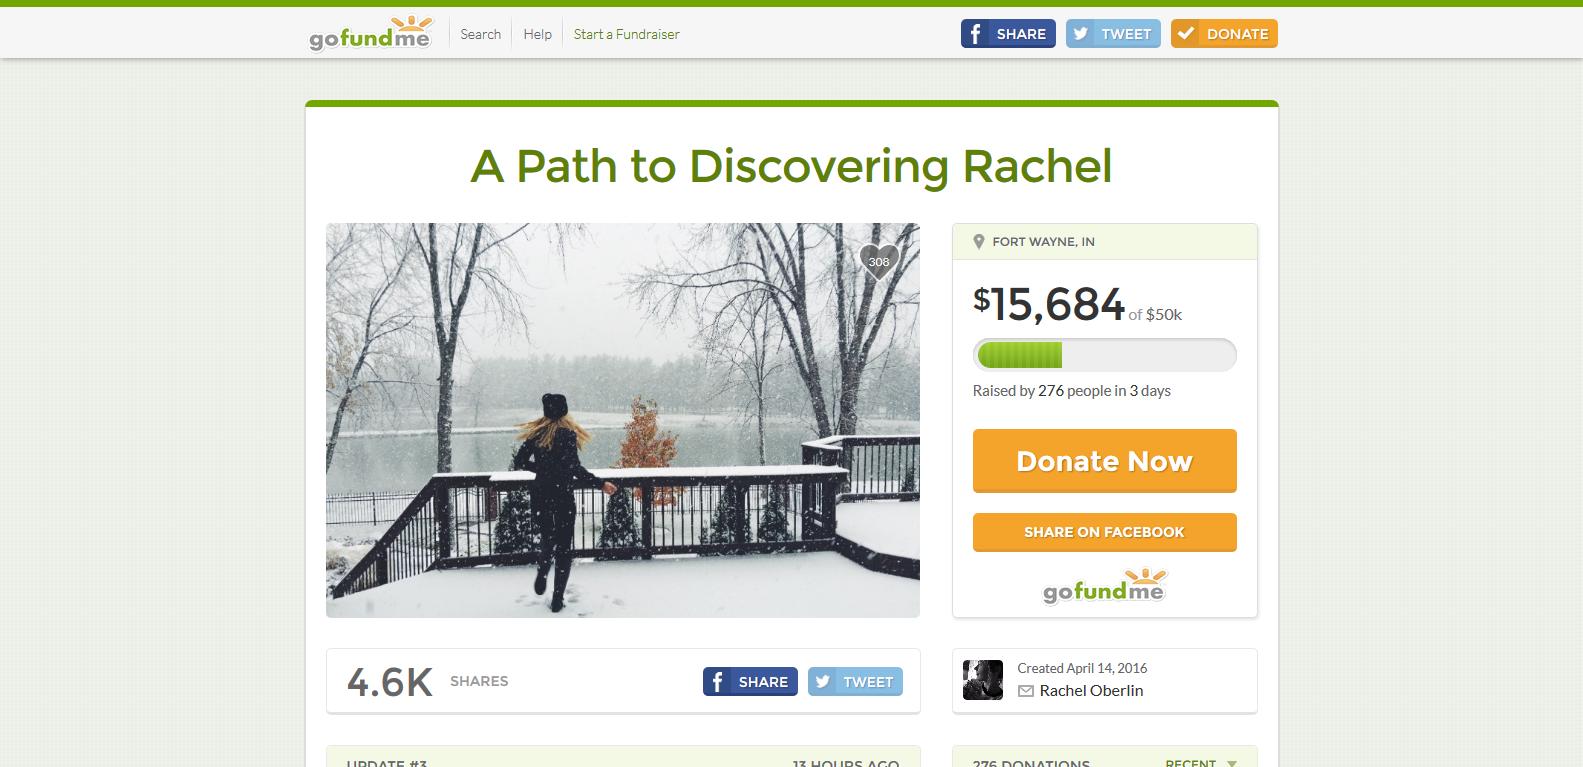 A_Path_to_Discovering_Rachel_by_Rachel_Oberlin_-_GoFundMe_-_2016-04-18_13.16.58